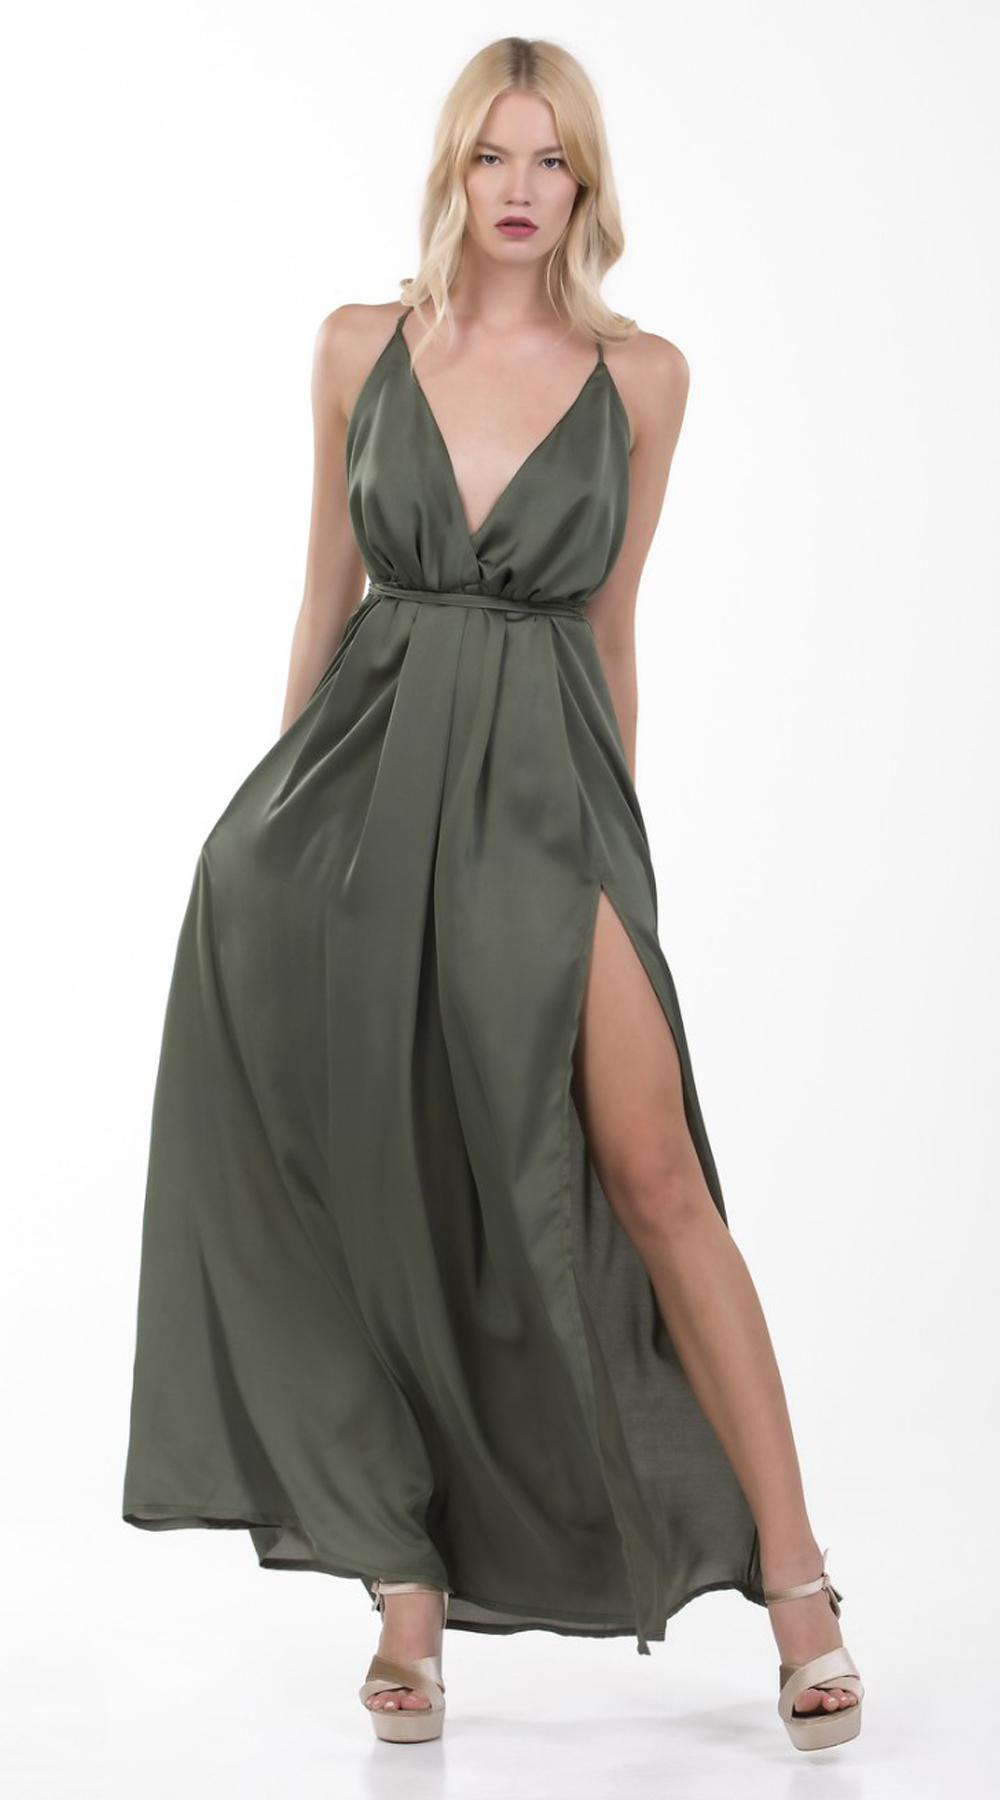 5a405f1eb798 Μάξι Σατινέ Φόρεμα Online - MissReina - S17ON-5094578